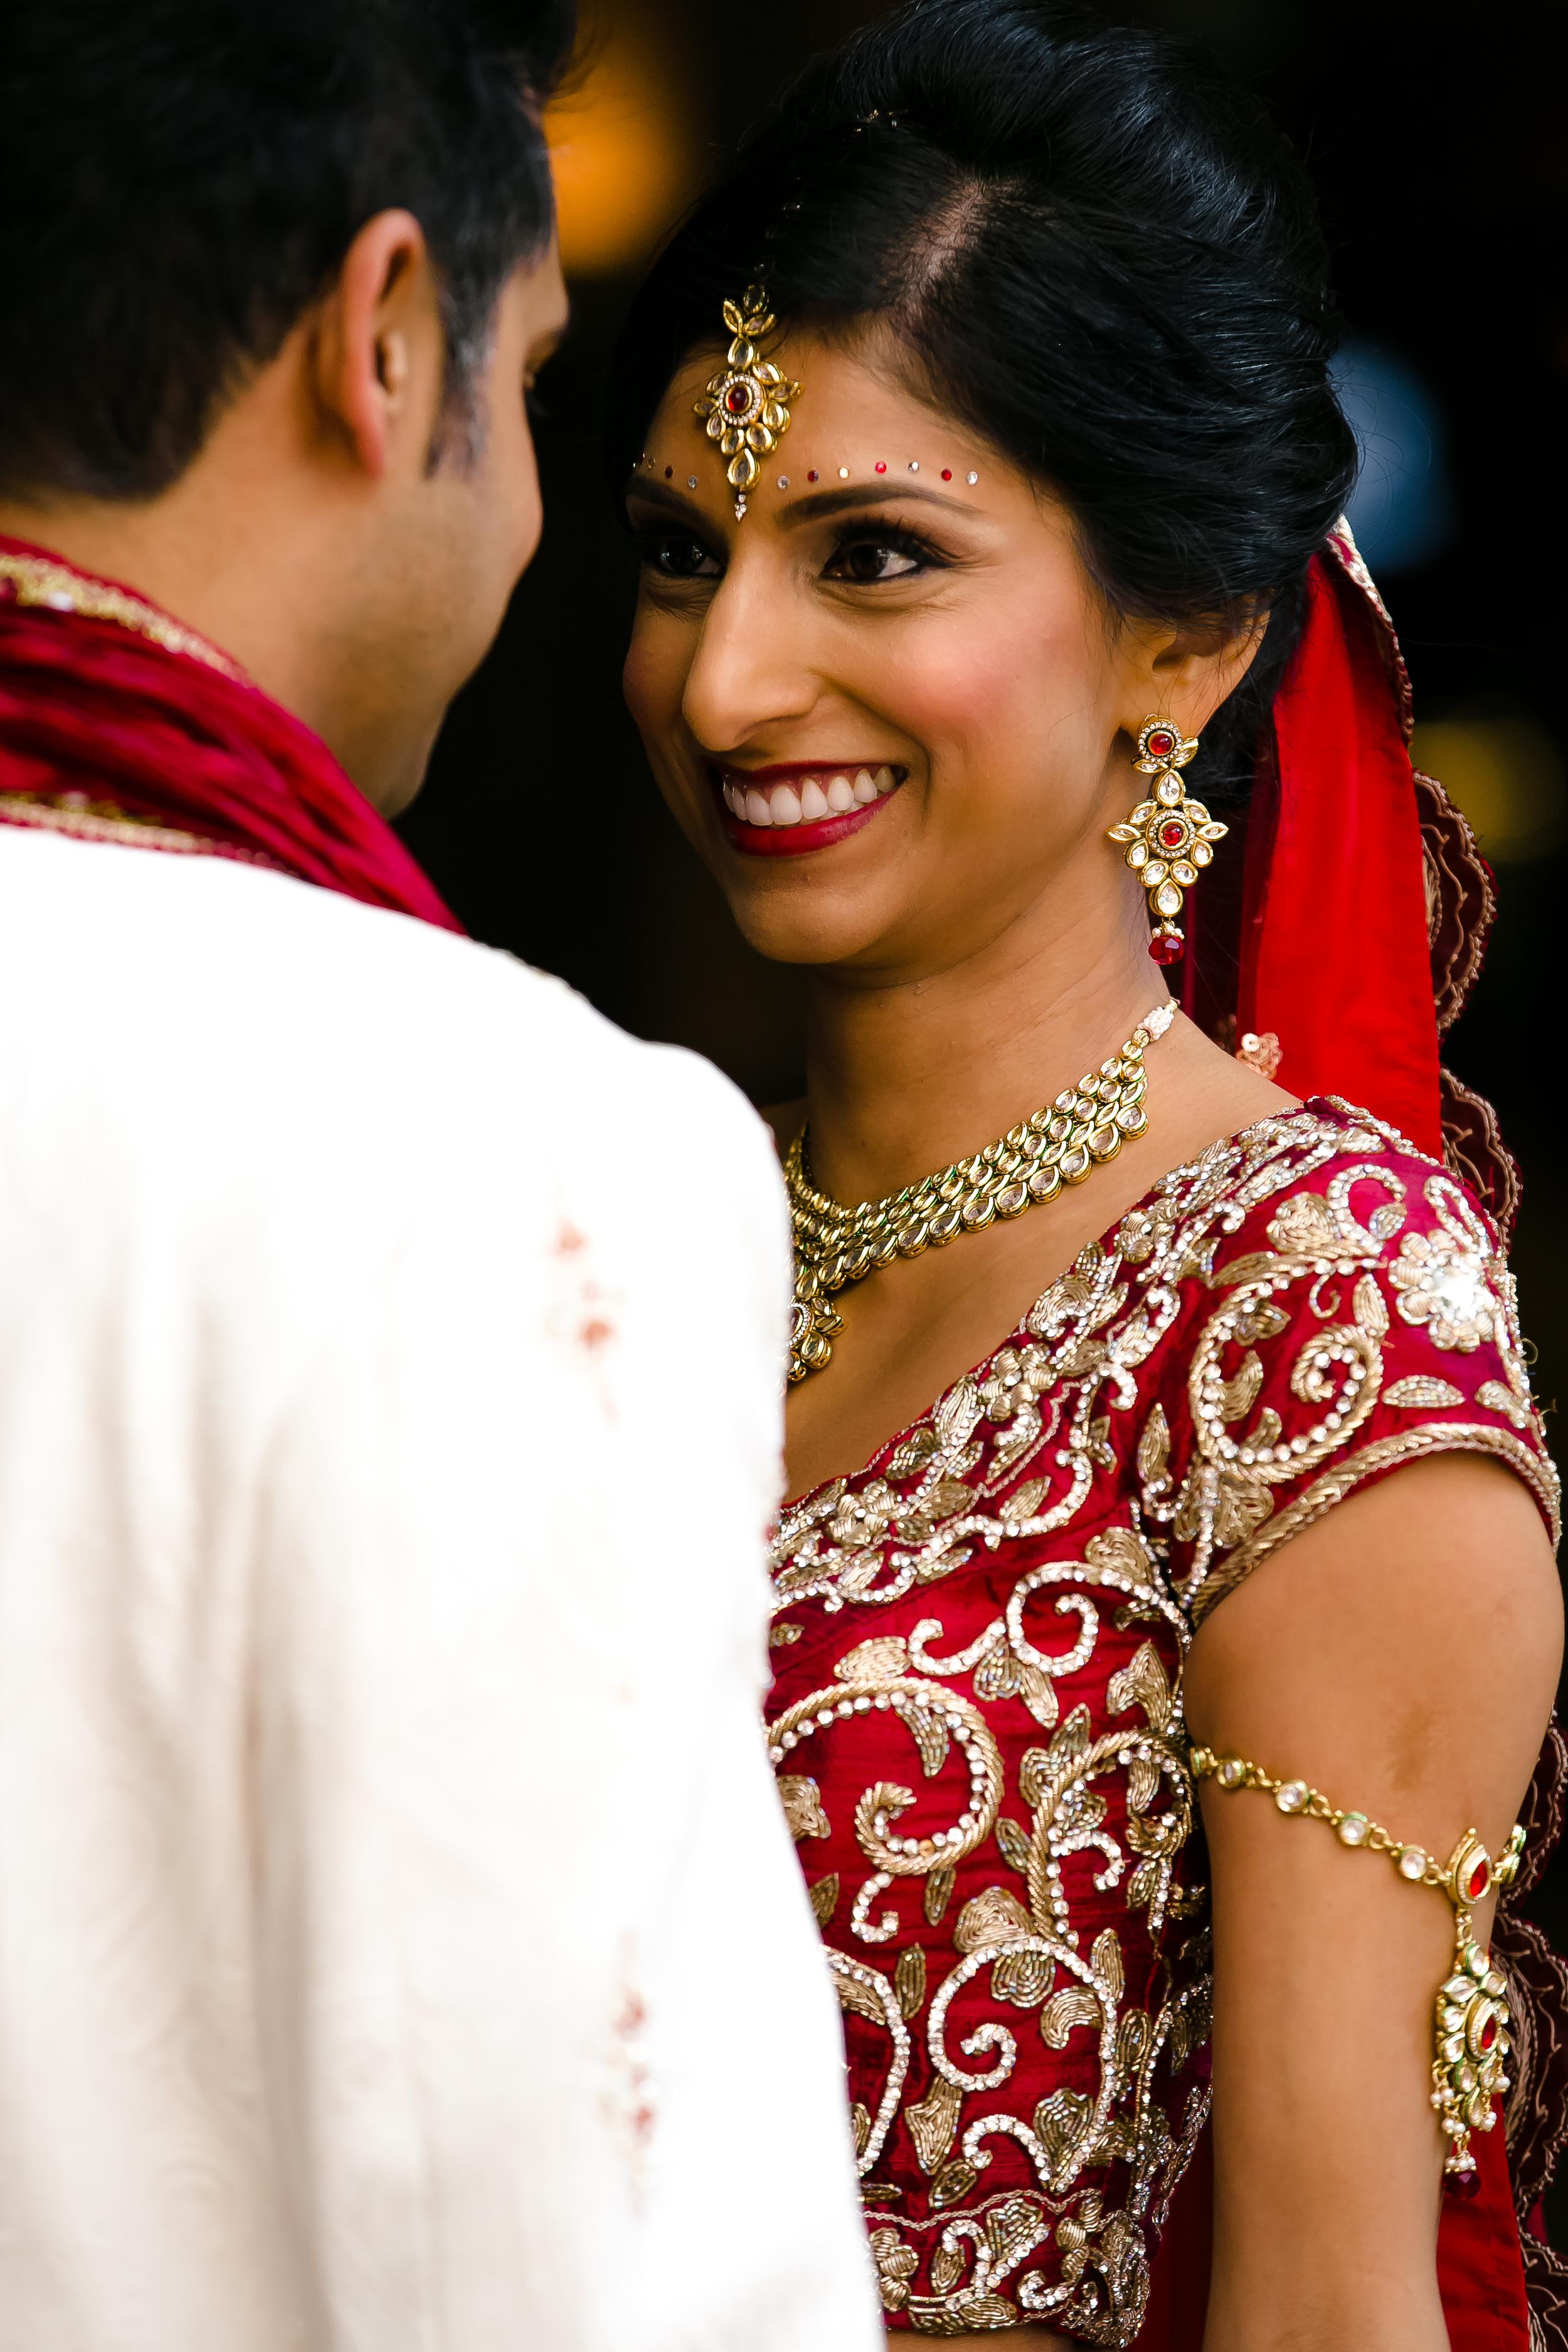 SOUTHEAST-ASIAN-INDIAN-WEDDING_012.jpg